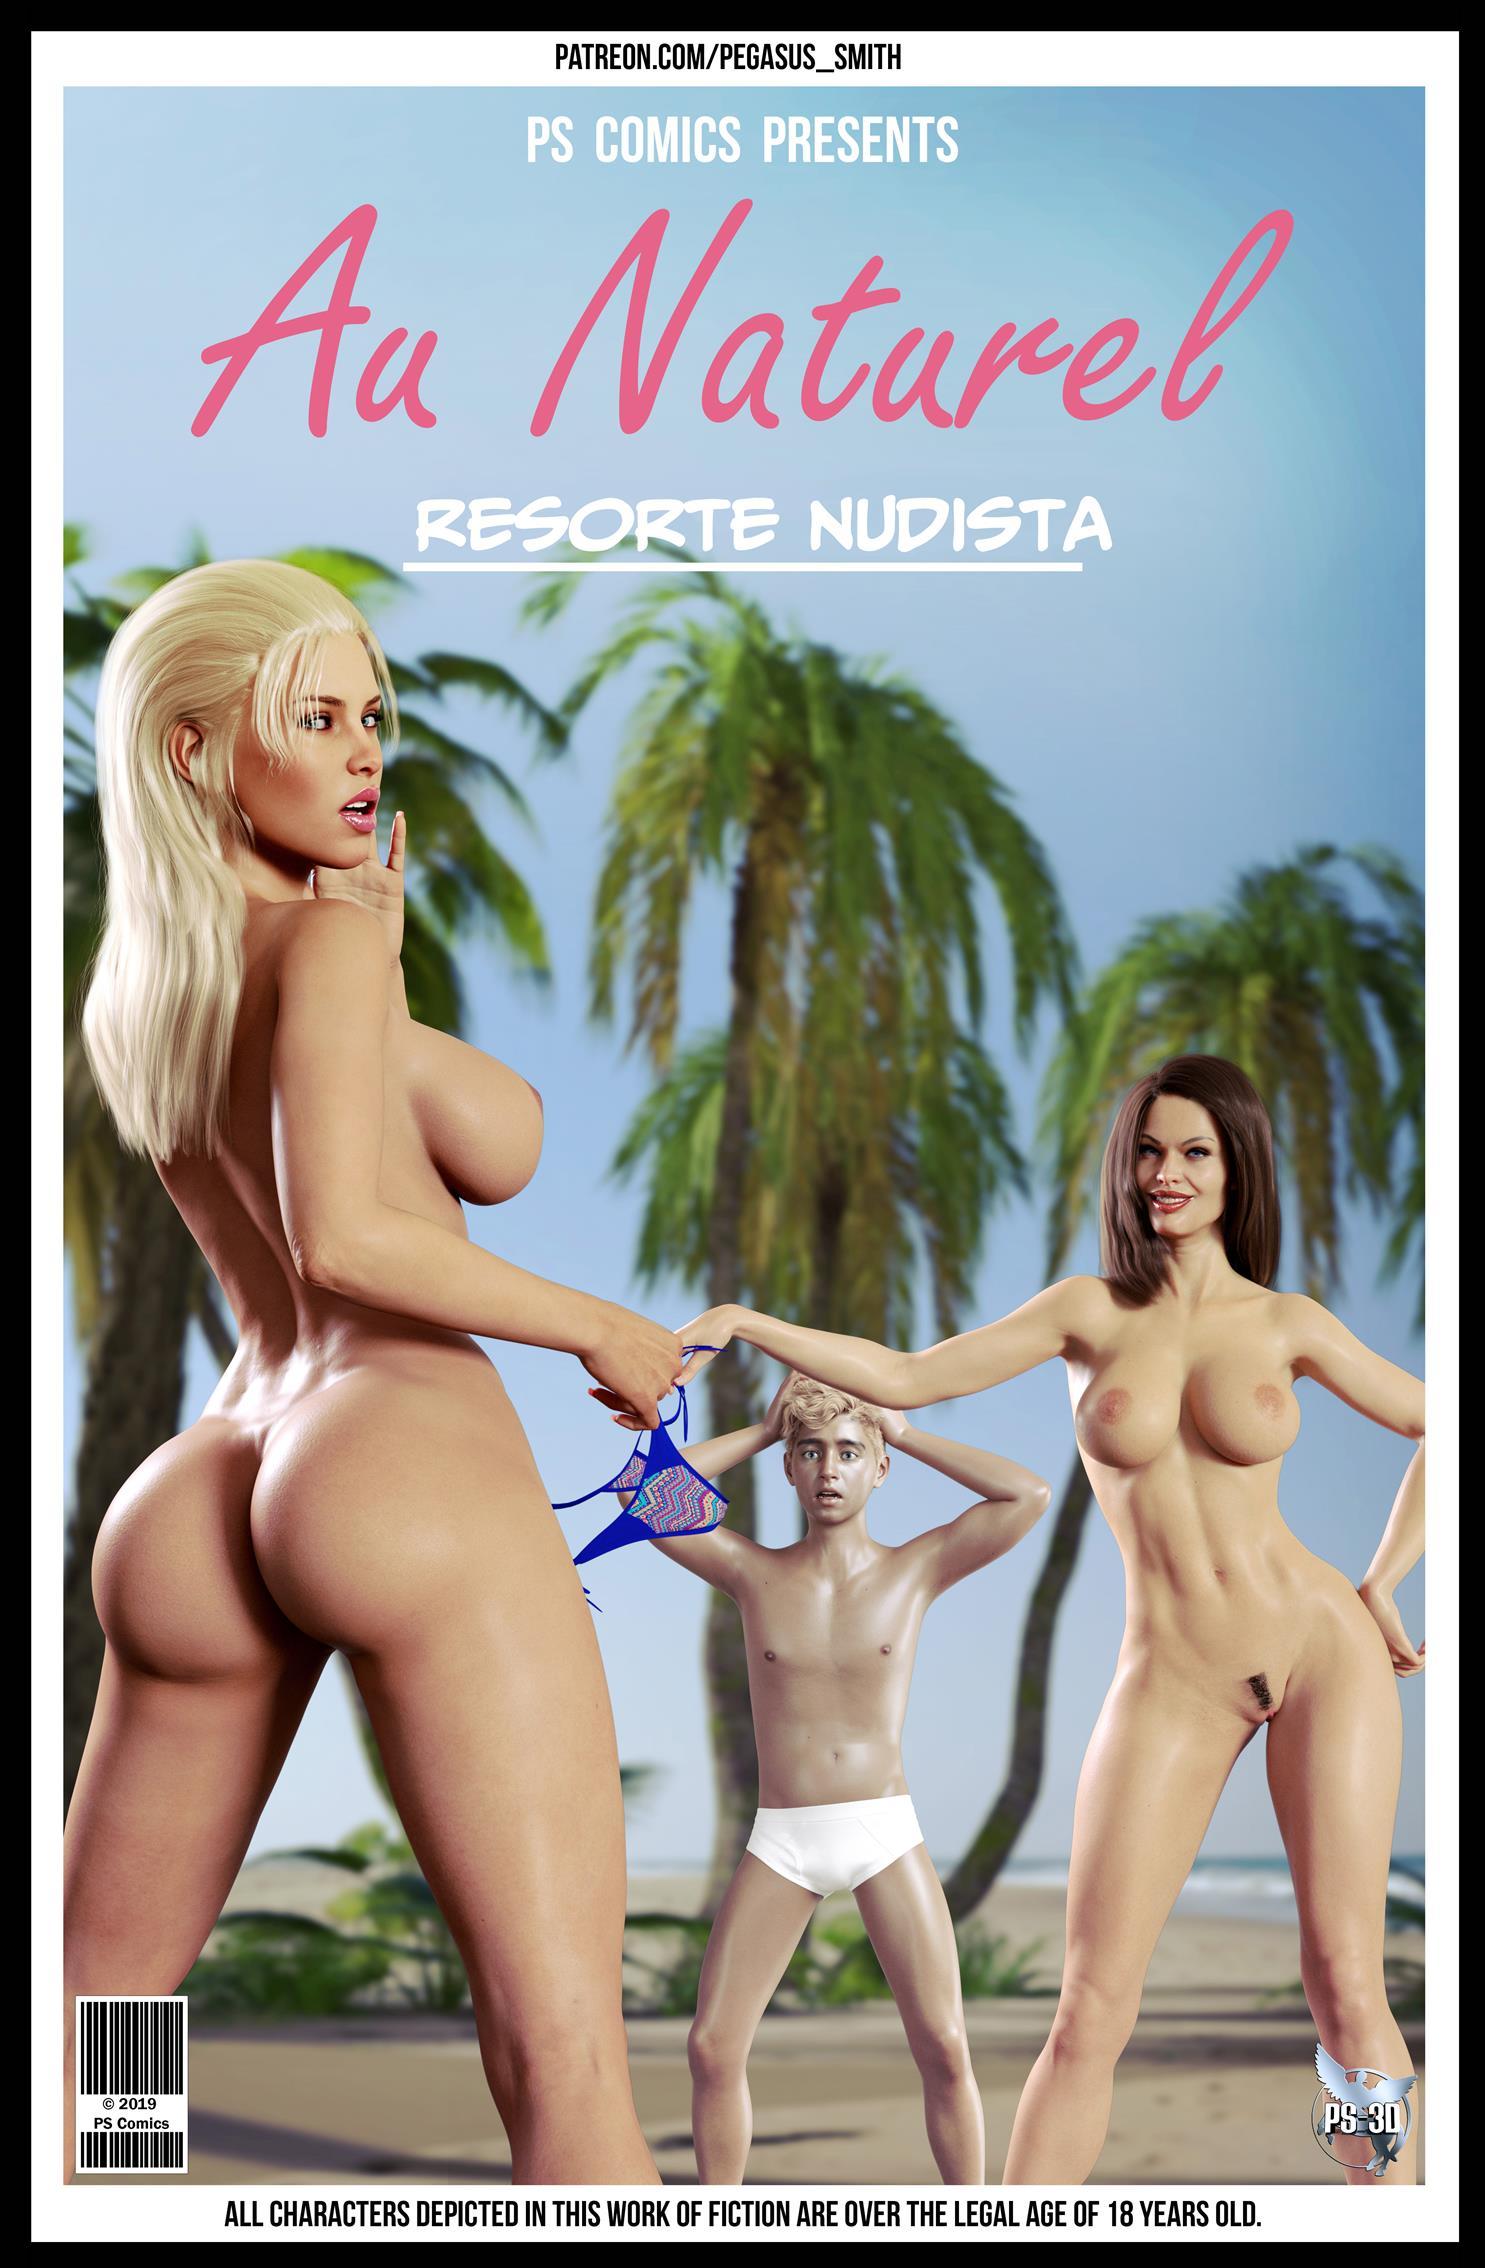 Resorte nudista ao natural